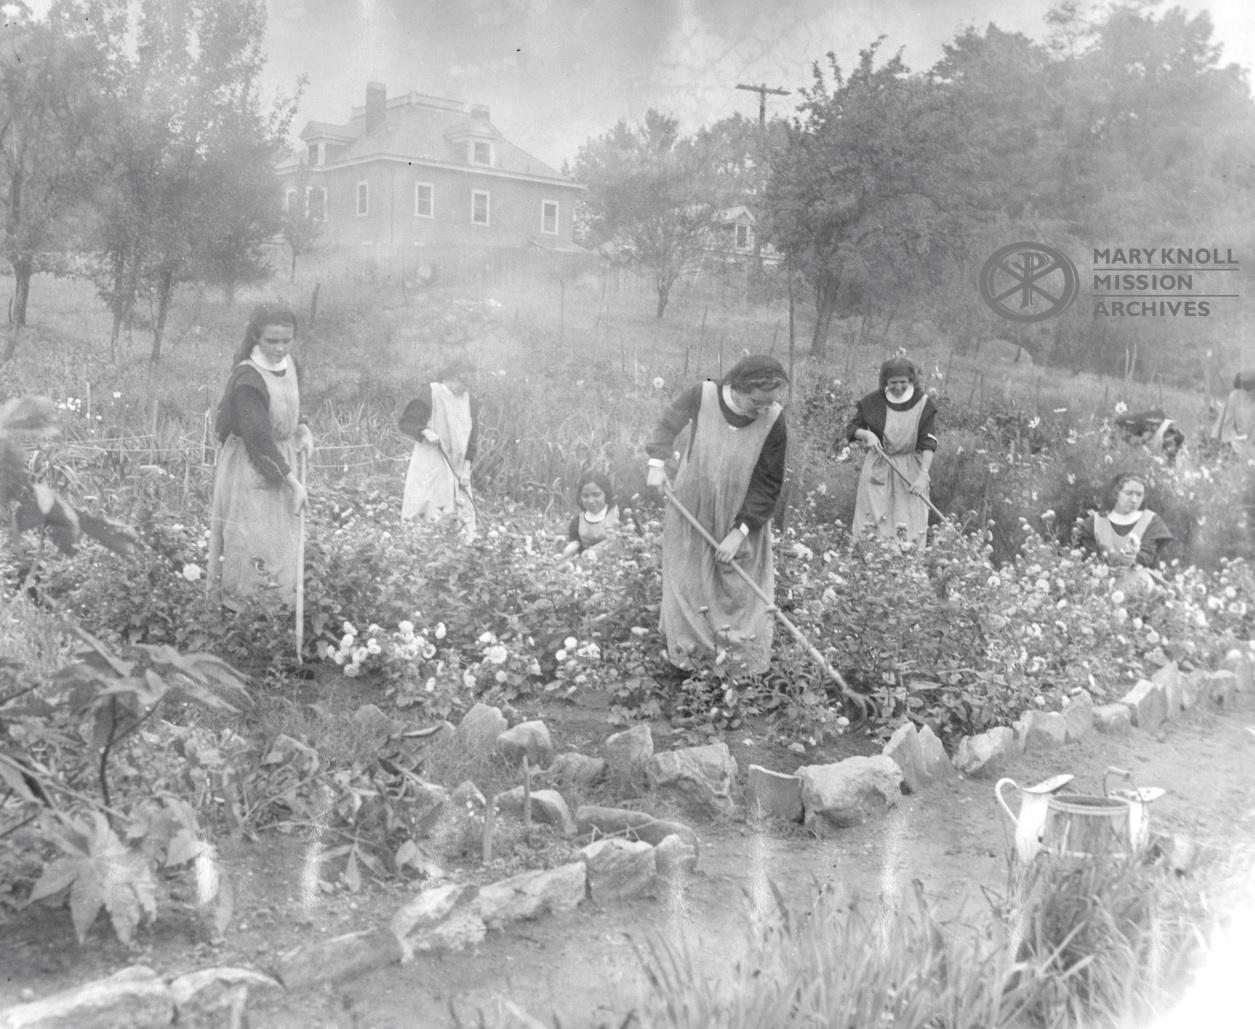 Postulants gardening at the Motherhouse, 1936